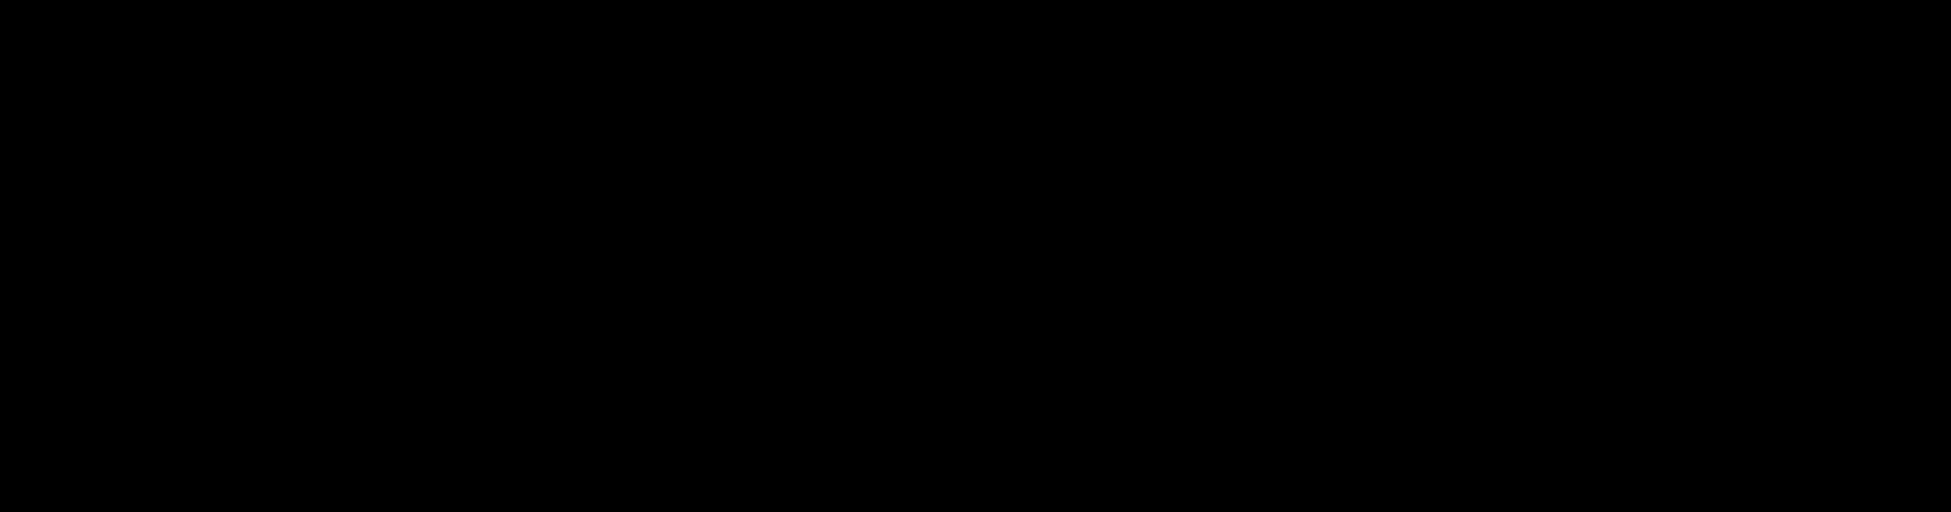 image89.png